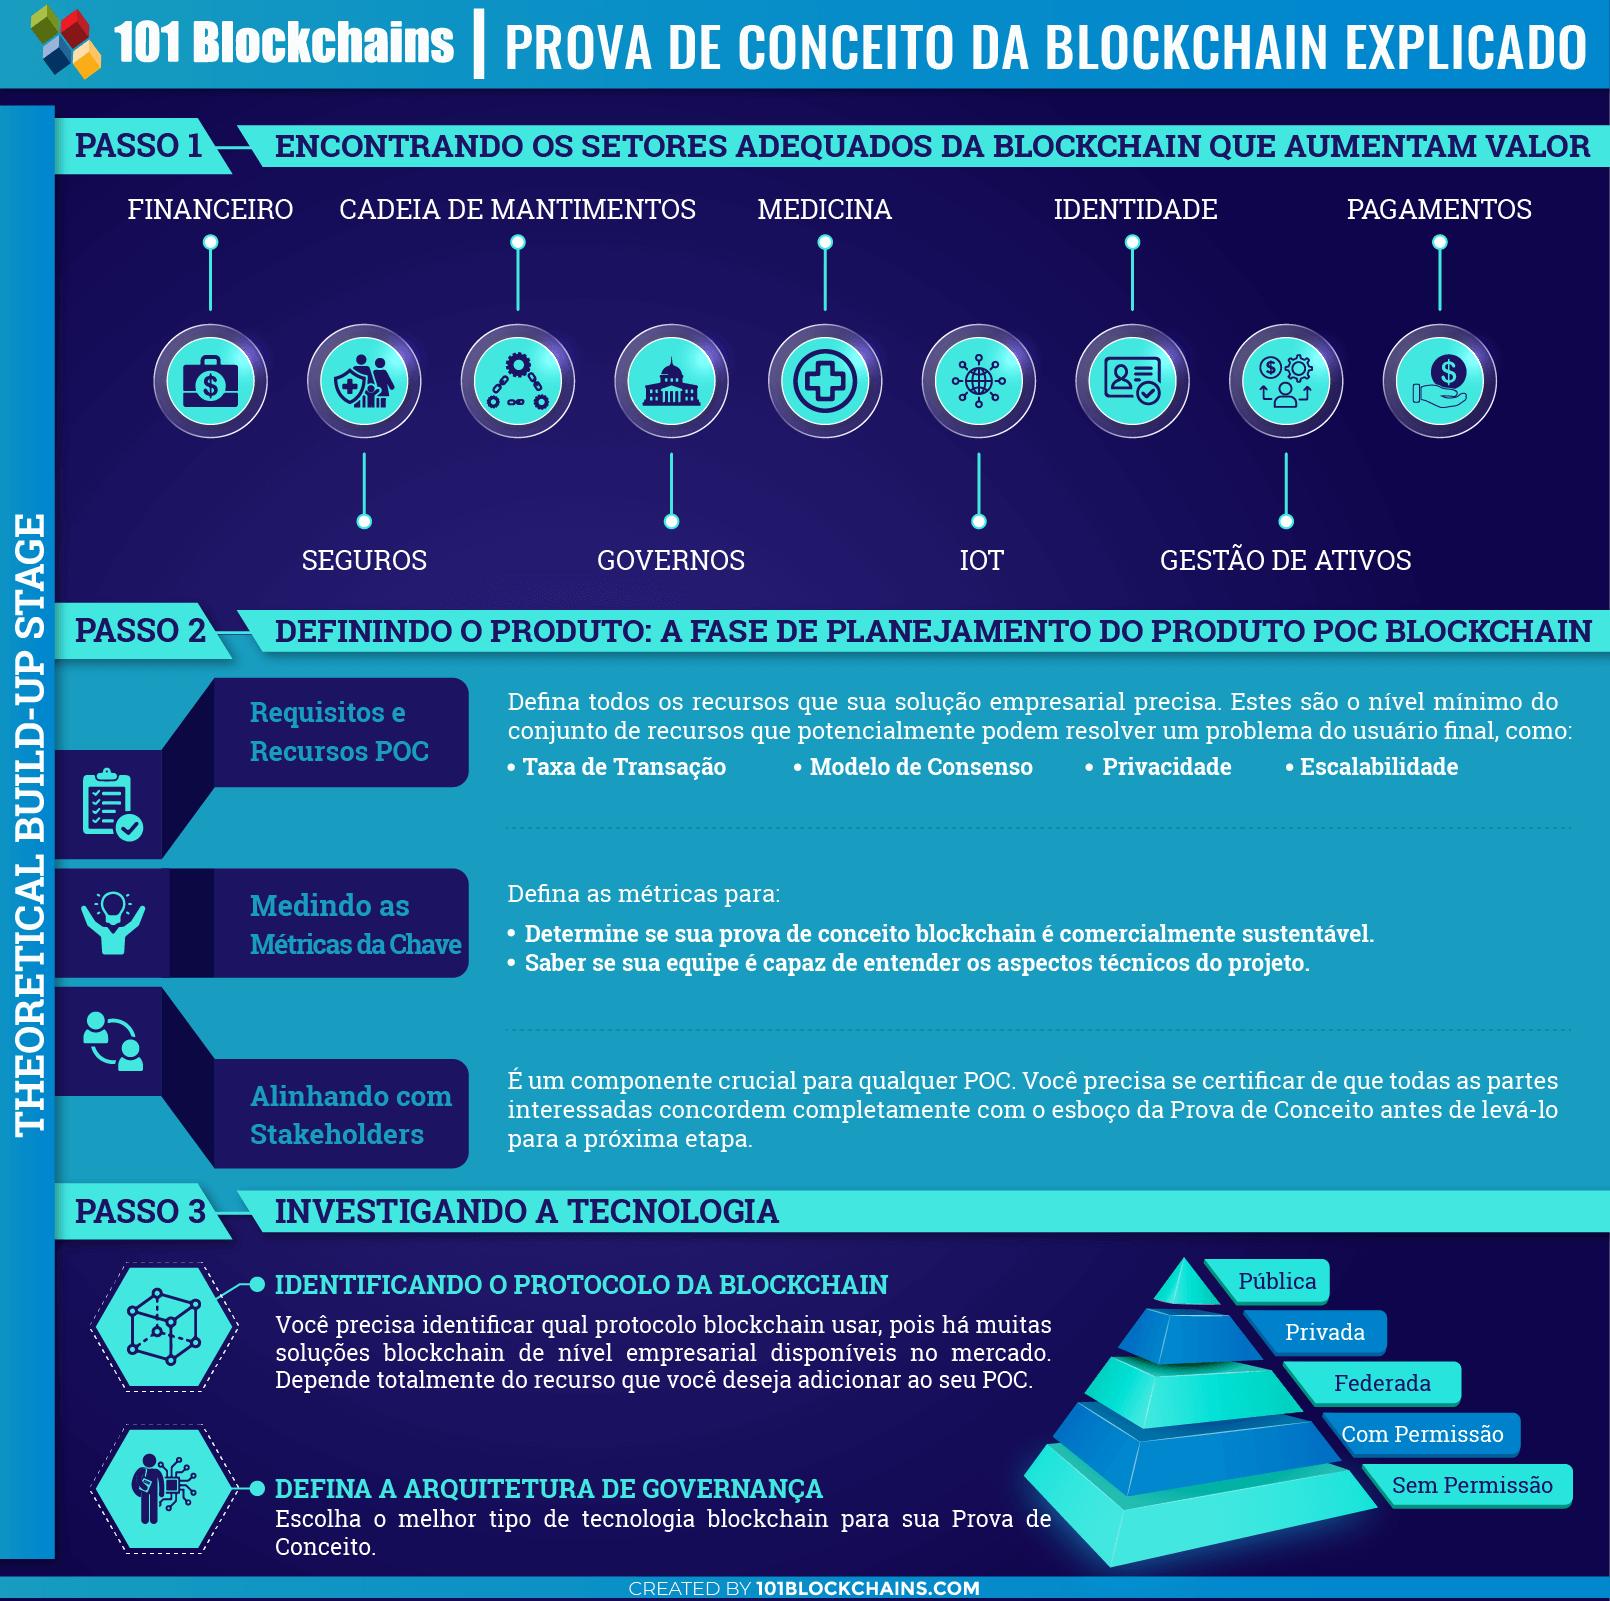 Prova de Conceito da Blockchain Explicado POC